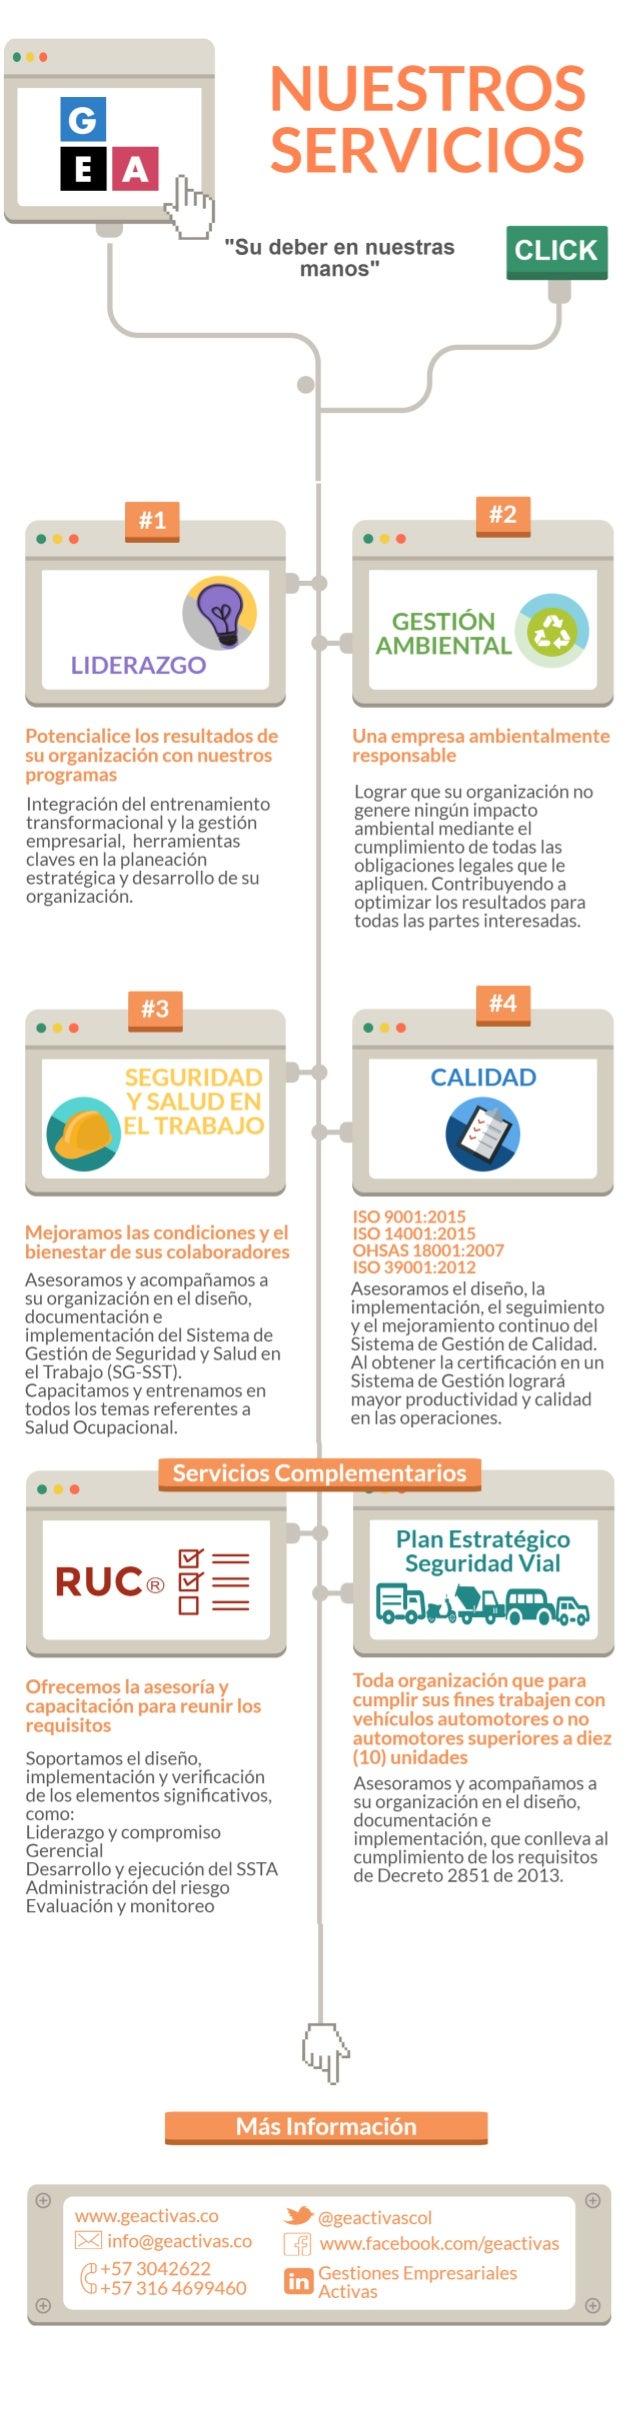 presentación servicios GEA